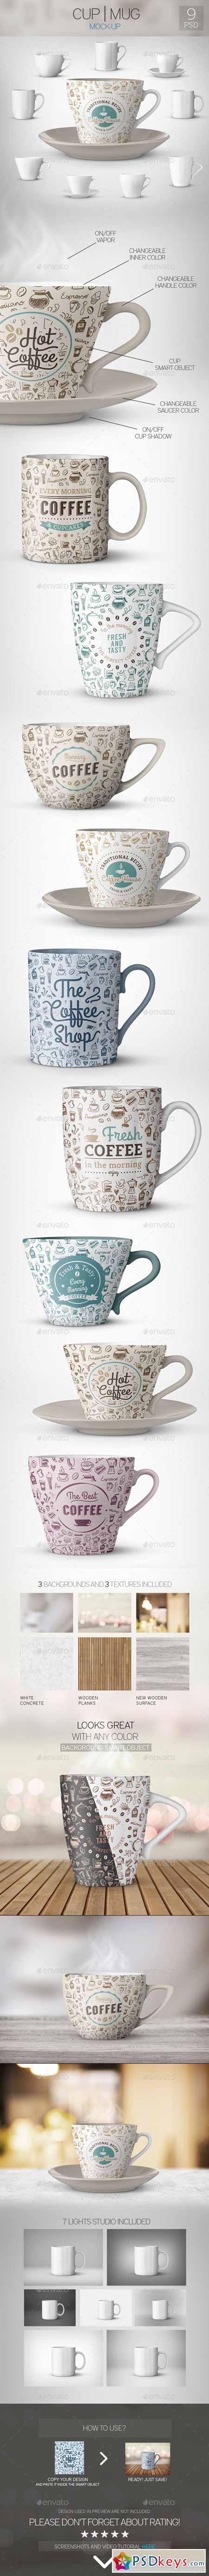 Cup Mug Mock-Up 10996648